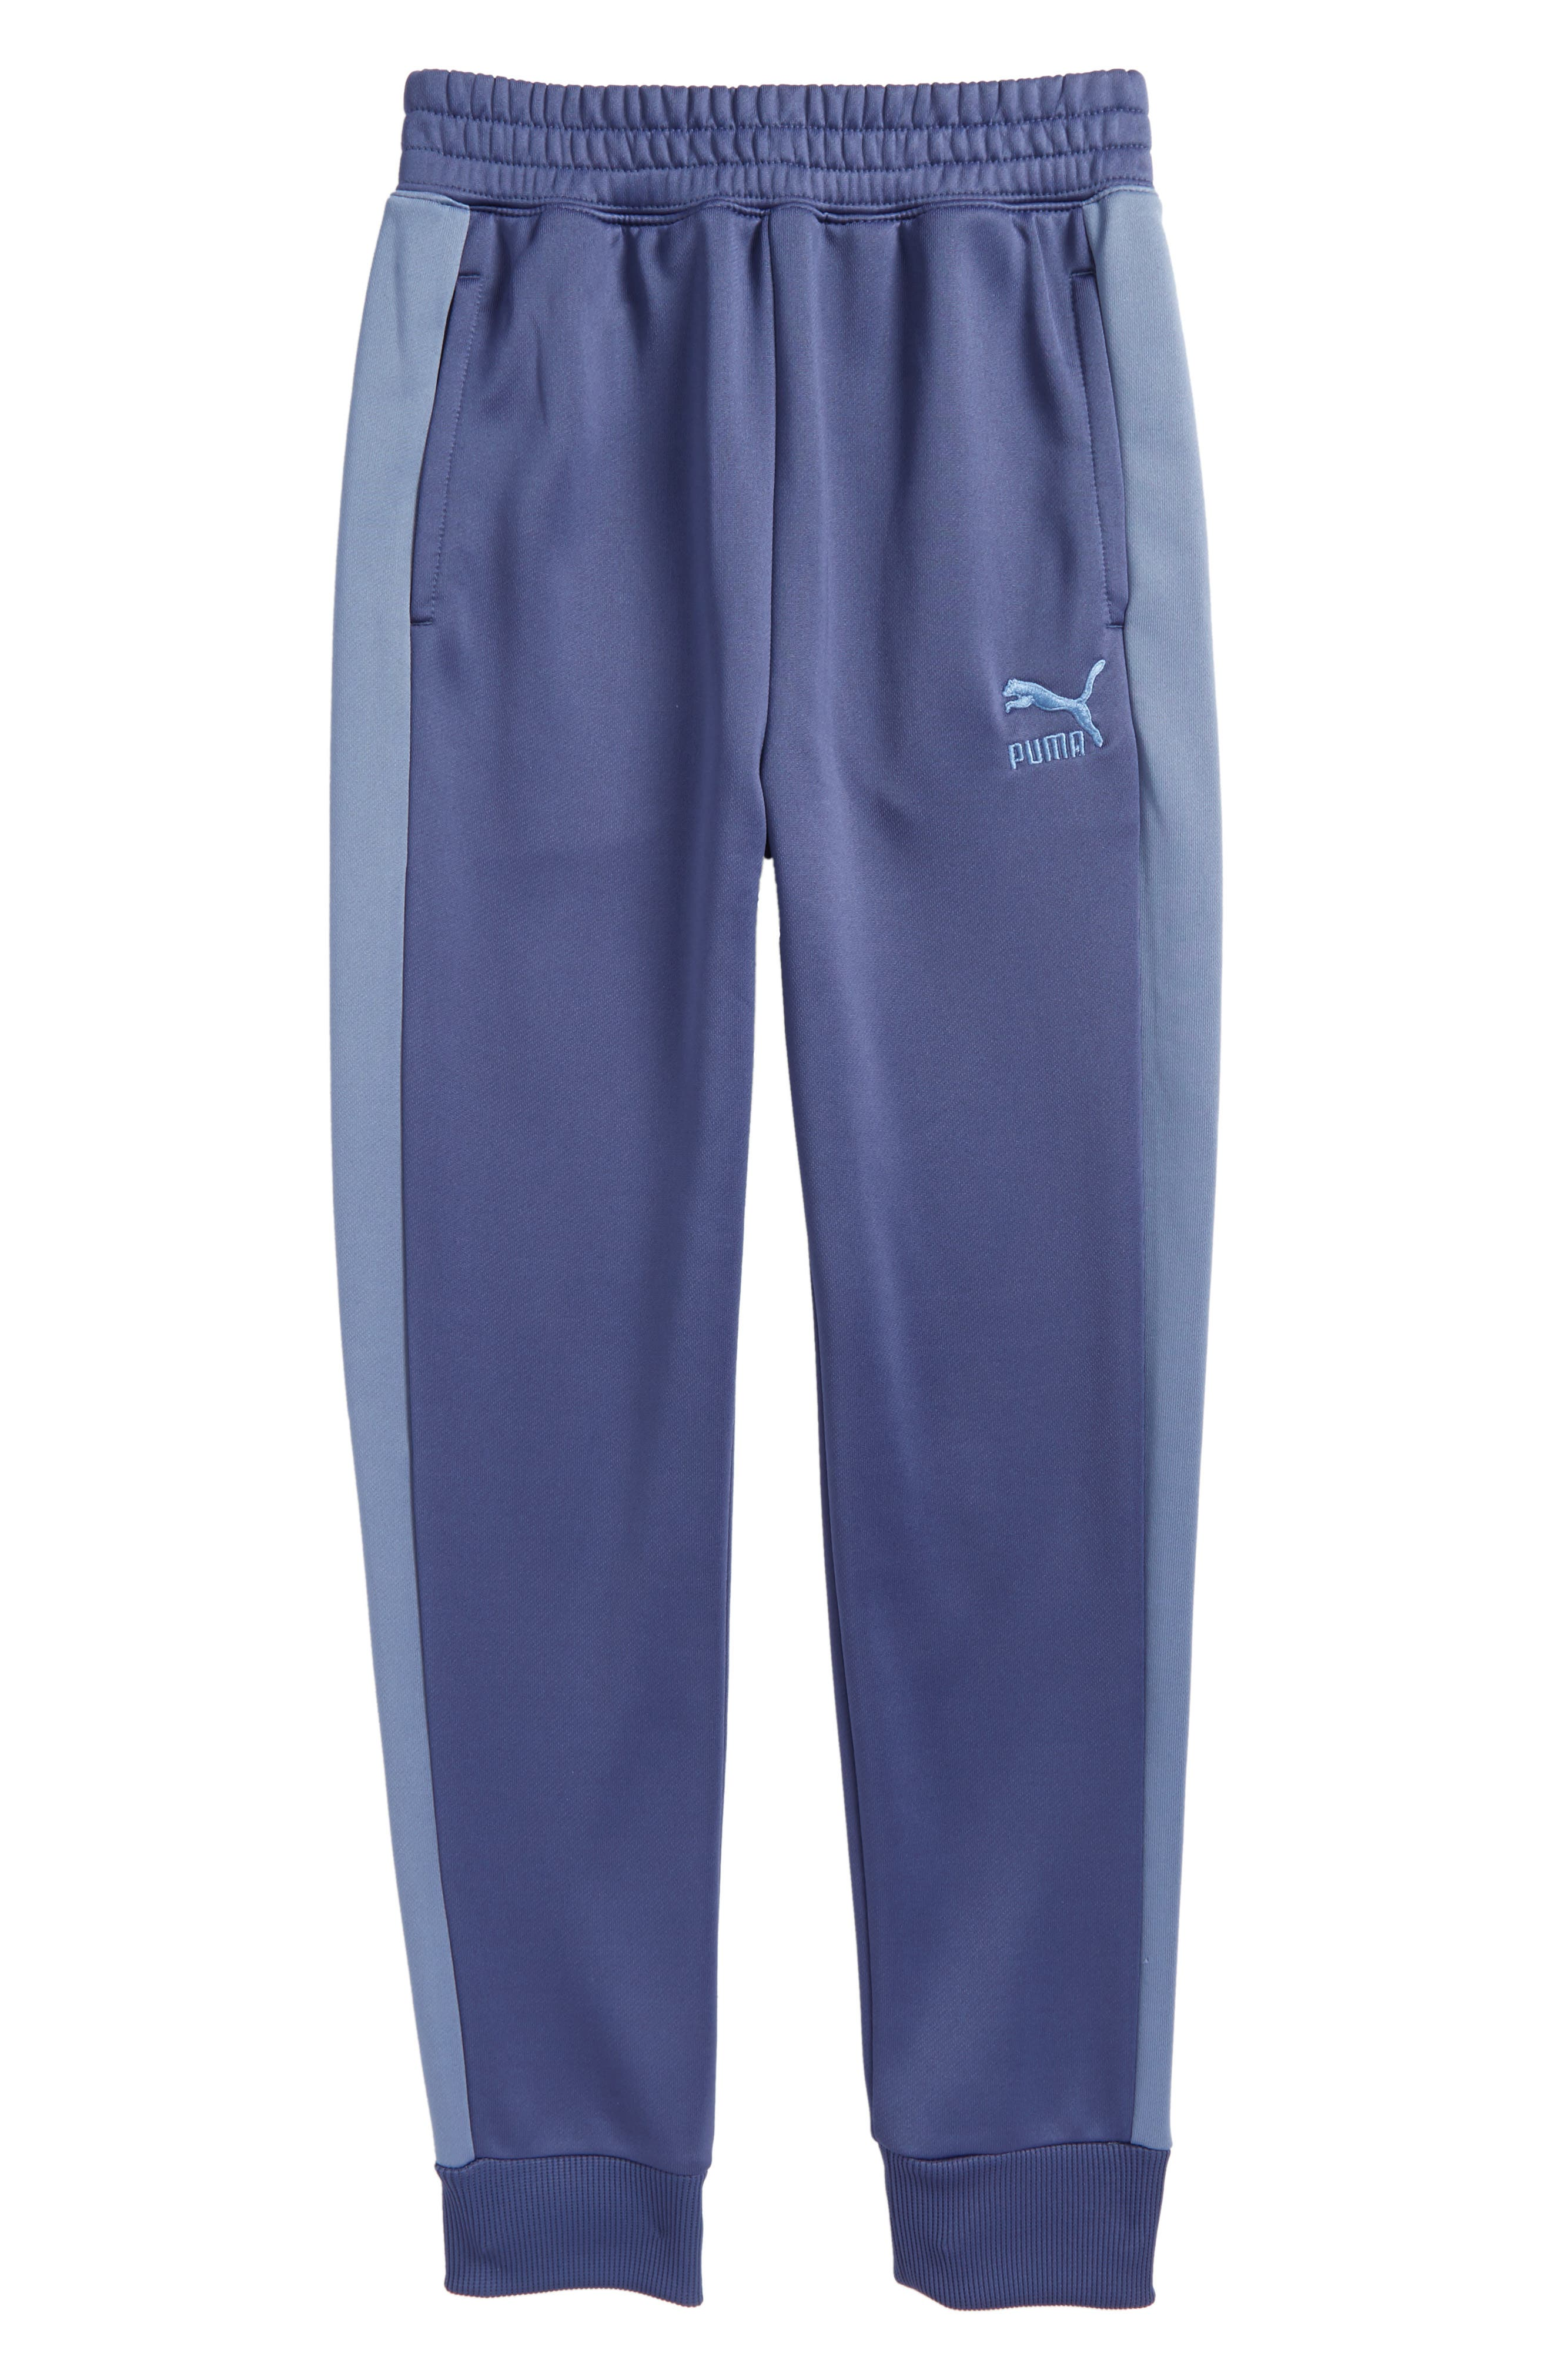 T7 Sweatpants,                             Main thumbnail 1, color,                             Blue Indigo